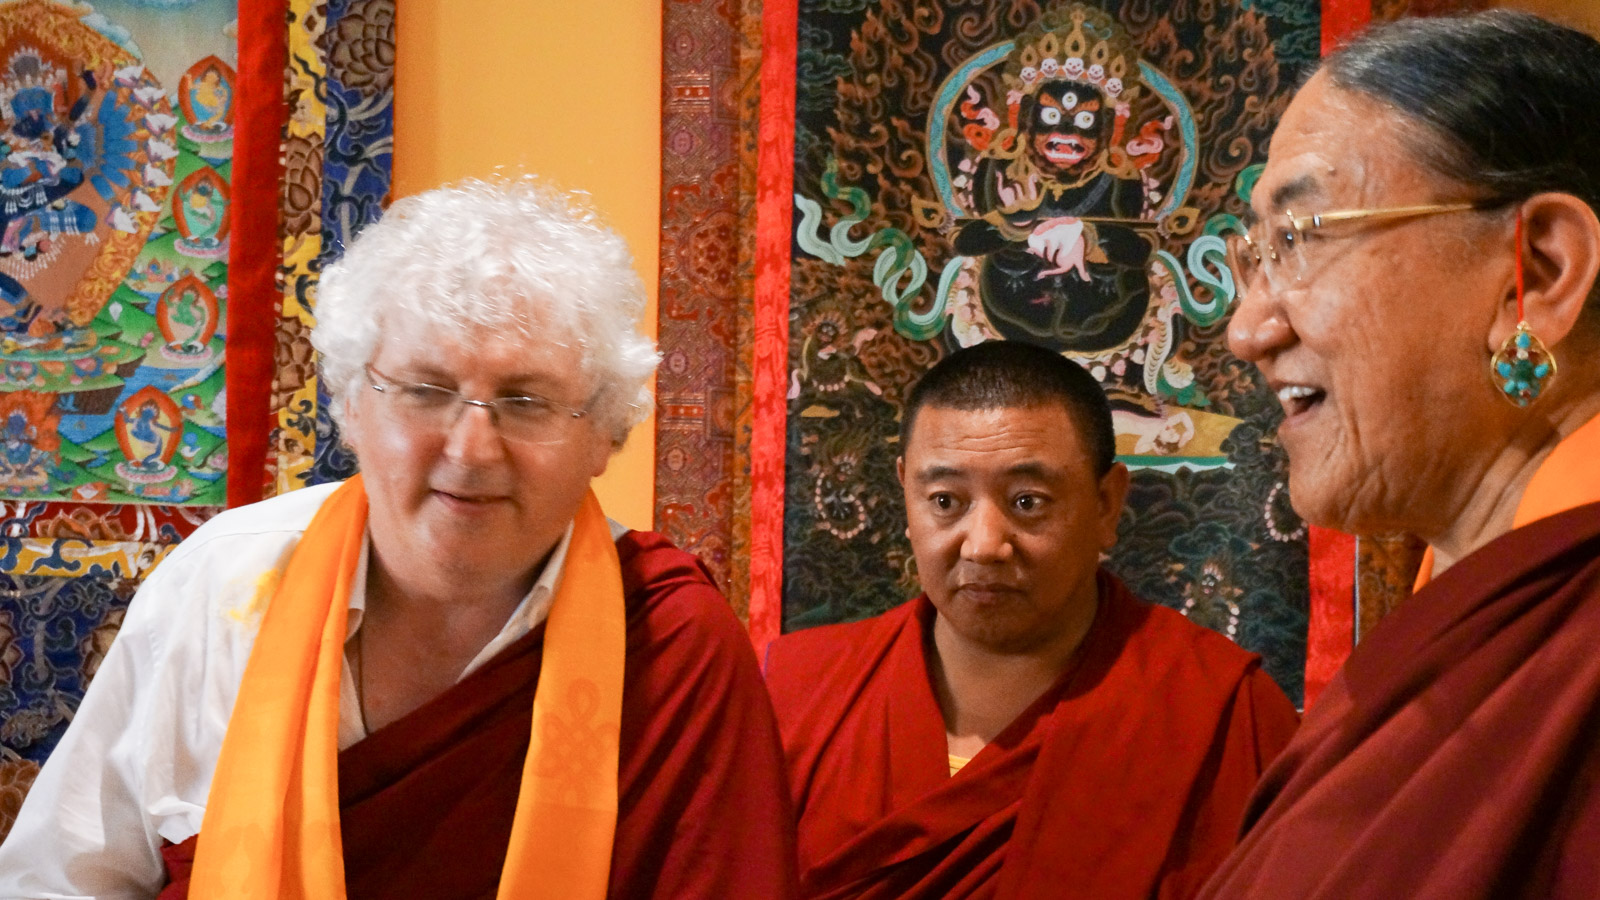 Visit of HH Sakya Trizin to Changlochen – July 2014